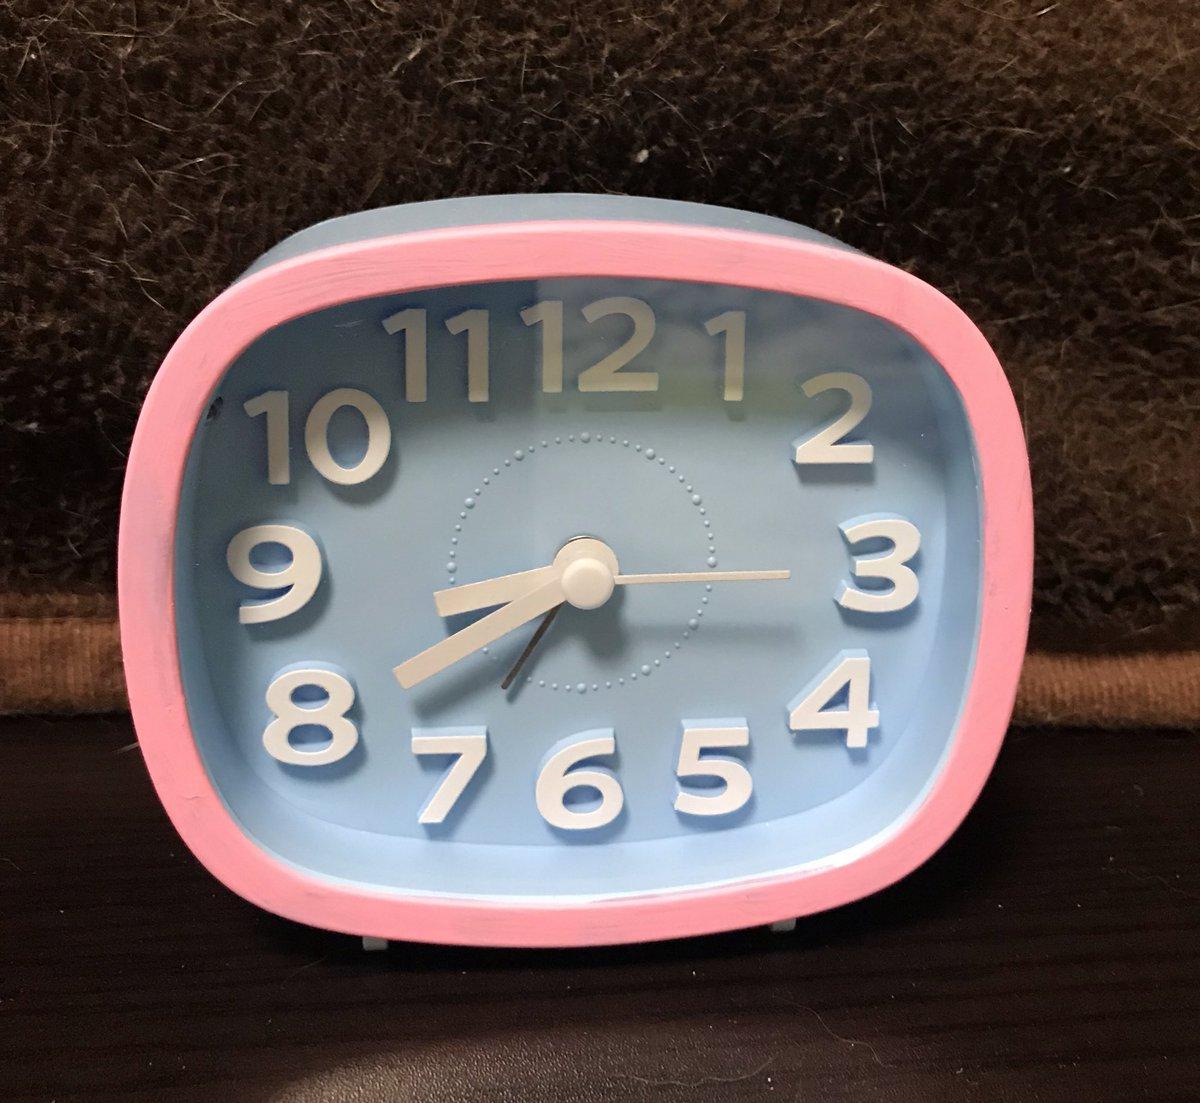 test ツイッターメディア - #ダイソー で買った水井300円時計にペインティングして #サガン鳥栖 カラーに!😆👍 あ、時計時間ずれてた。(笑)なう(2019/05/04 20:53:41) https://t.co/HDwwv36fj0